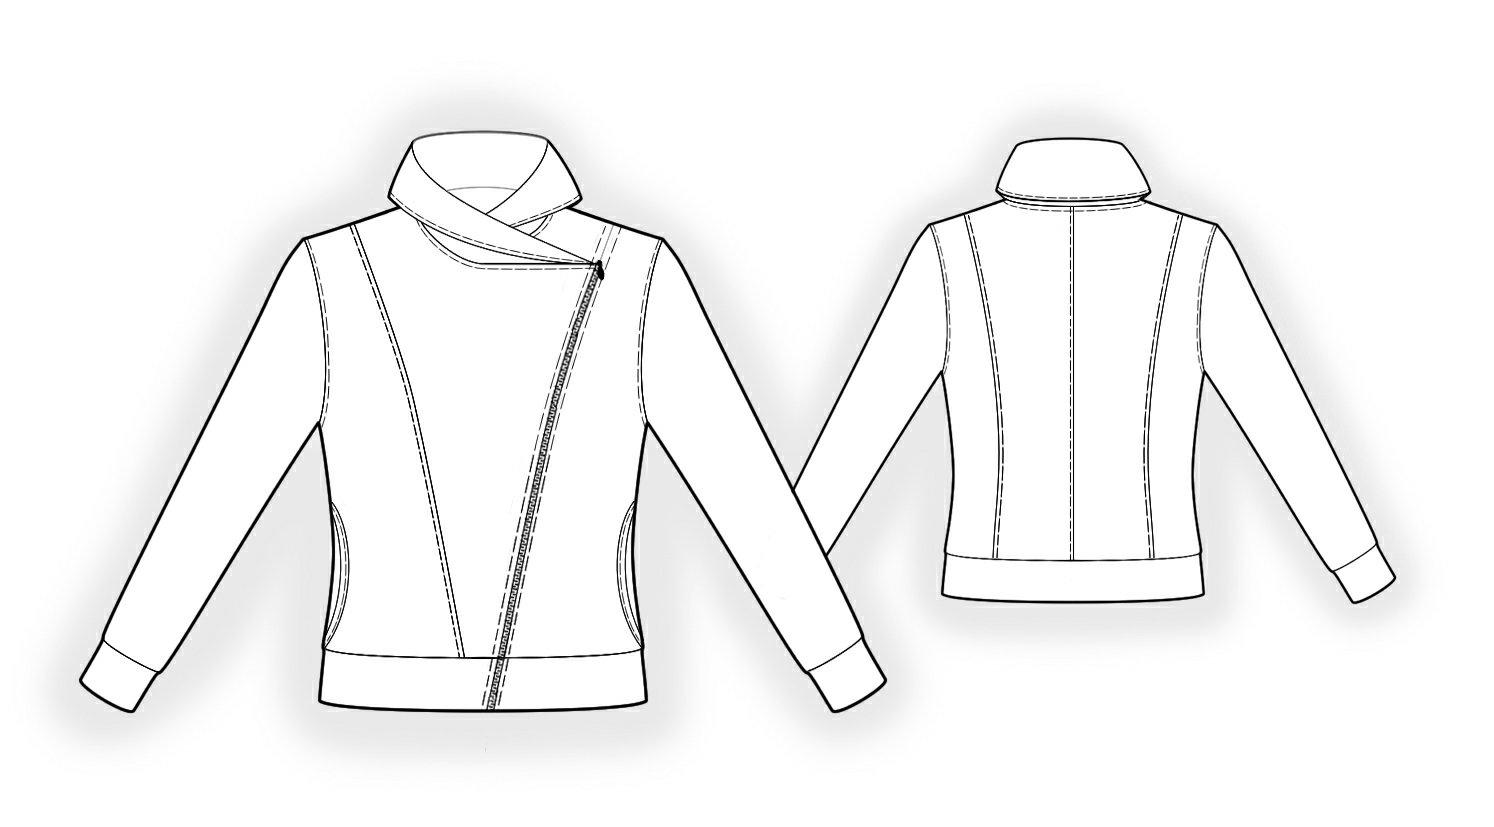 Sweatshirt - Sewing Pattern #4011. Made-to-measure sewing pattern ...